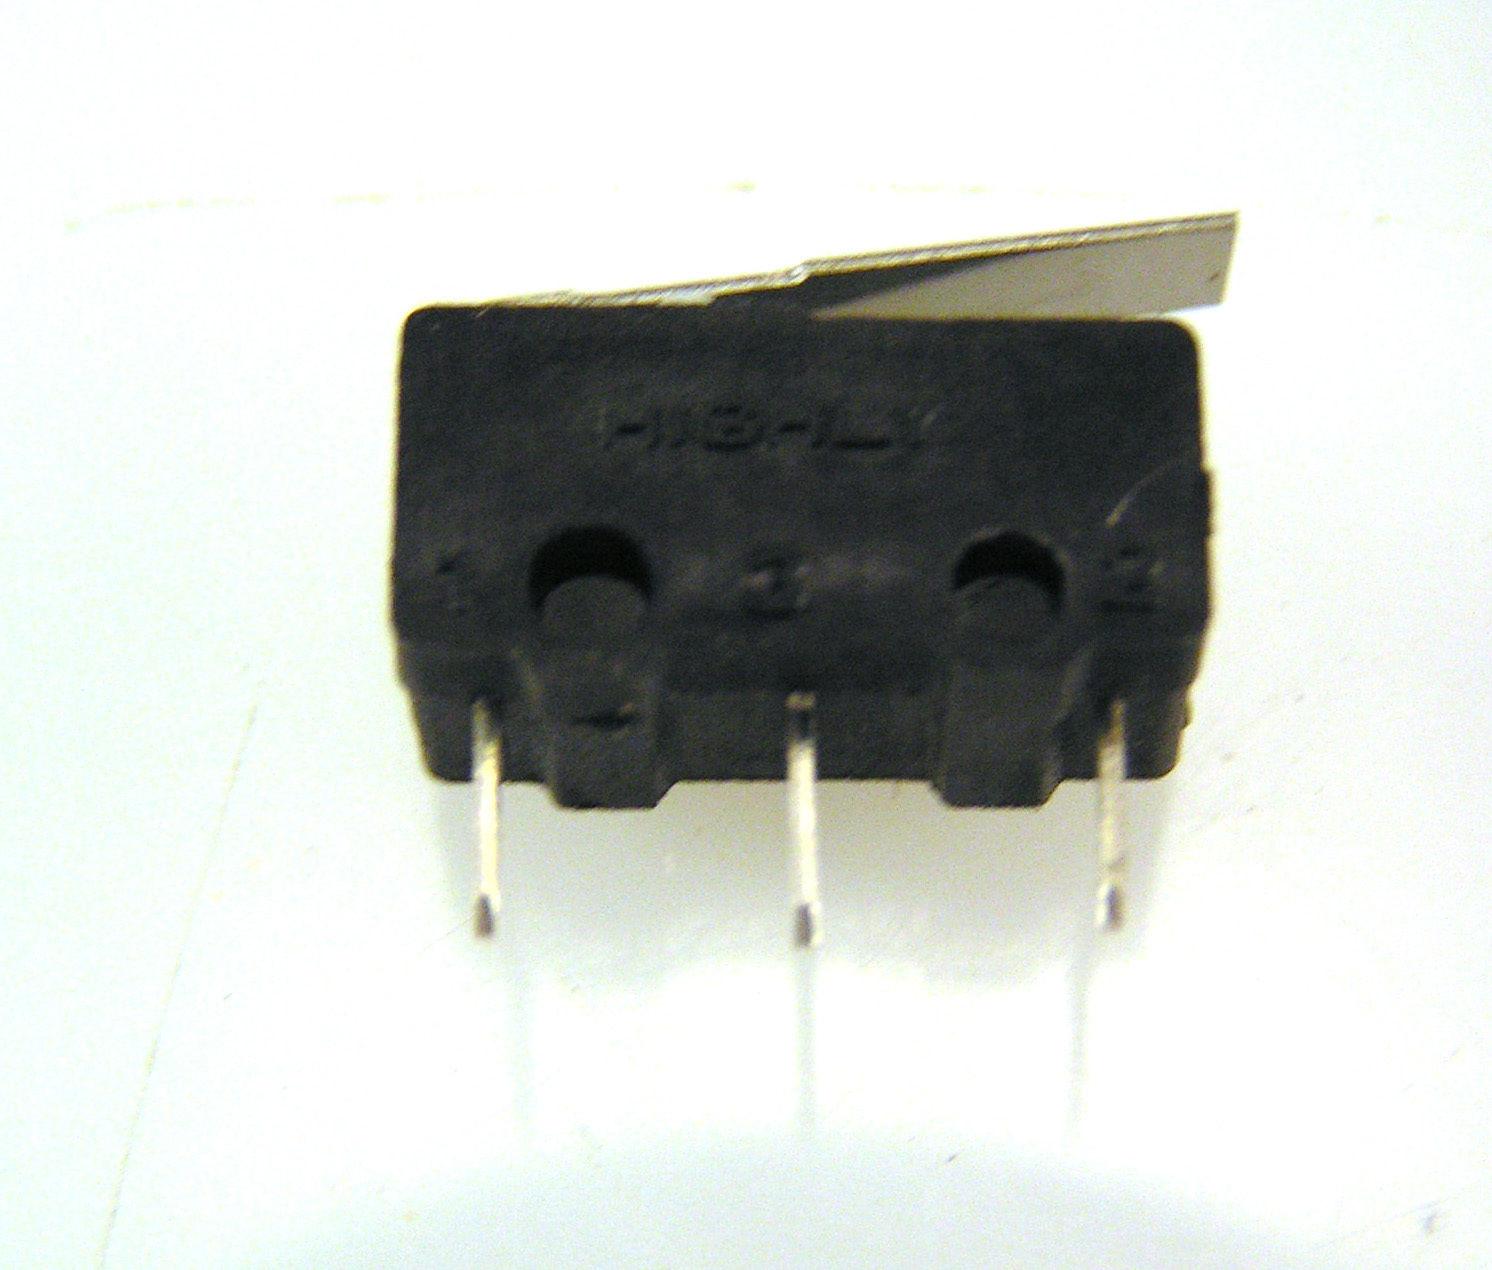 18pf 200V 5/% NPO CERAMIC RADIAL MLCC CAPACITORS NCM21NPO180J200 NIC QTY 50